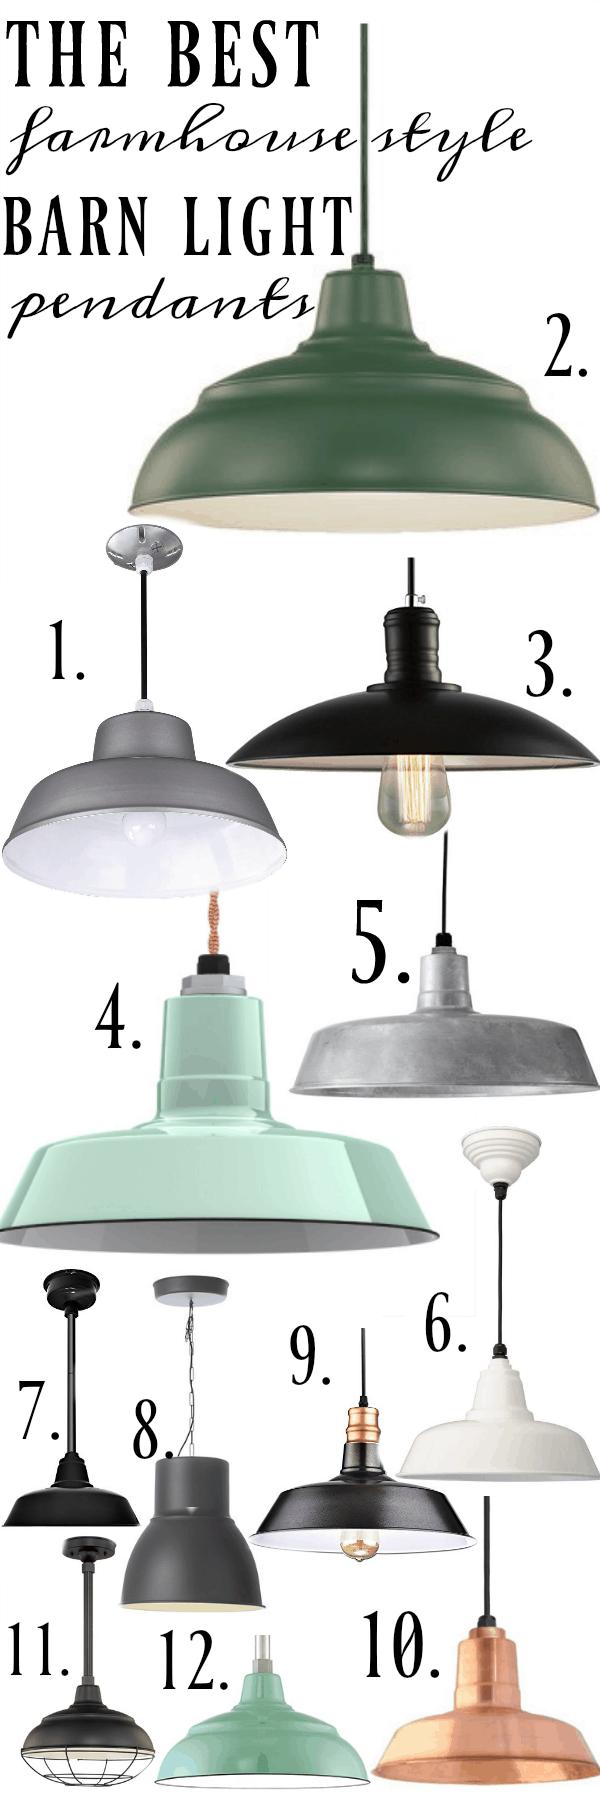 The best farmhouse style barn light pendants - The best barn light pendants a must pin for indoor/outdoor farmhouse style/cottage style lights.